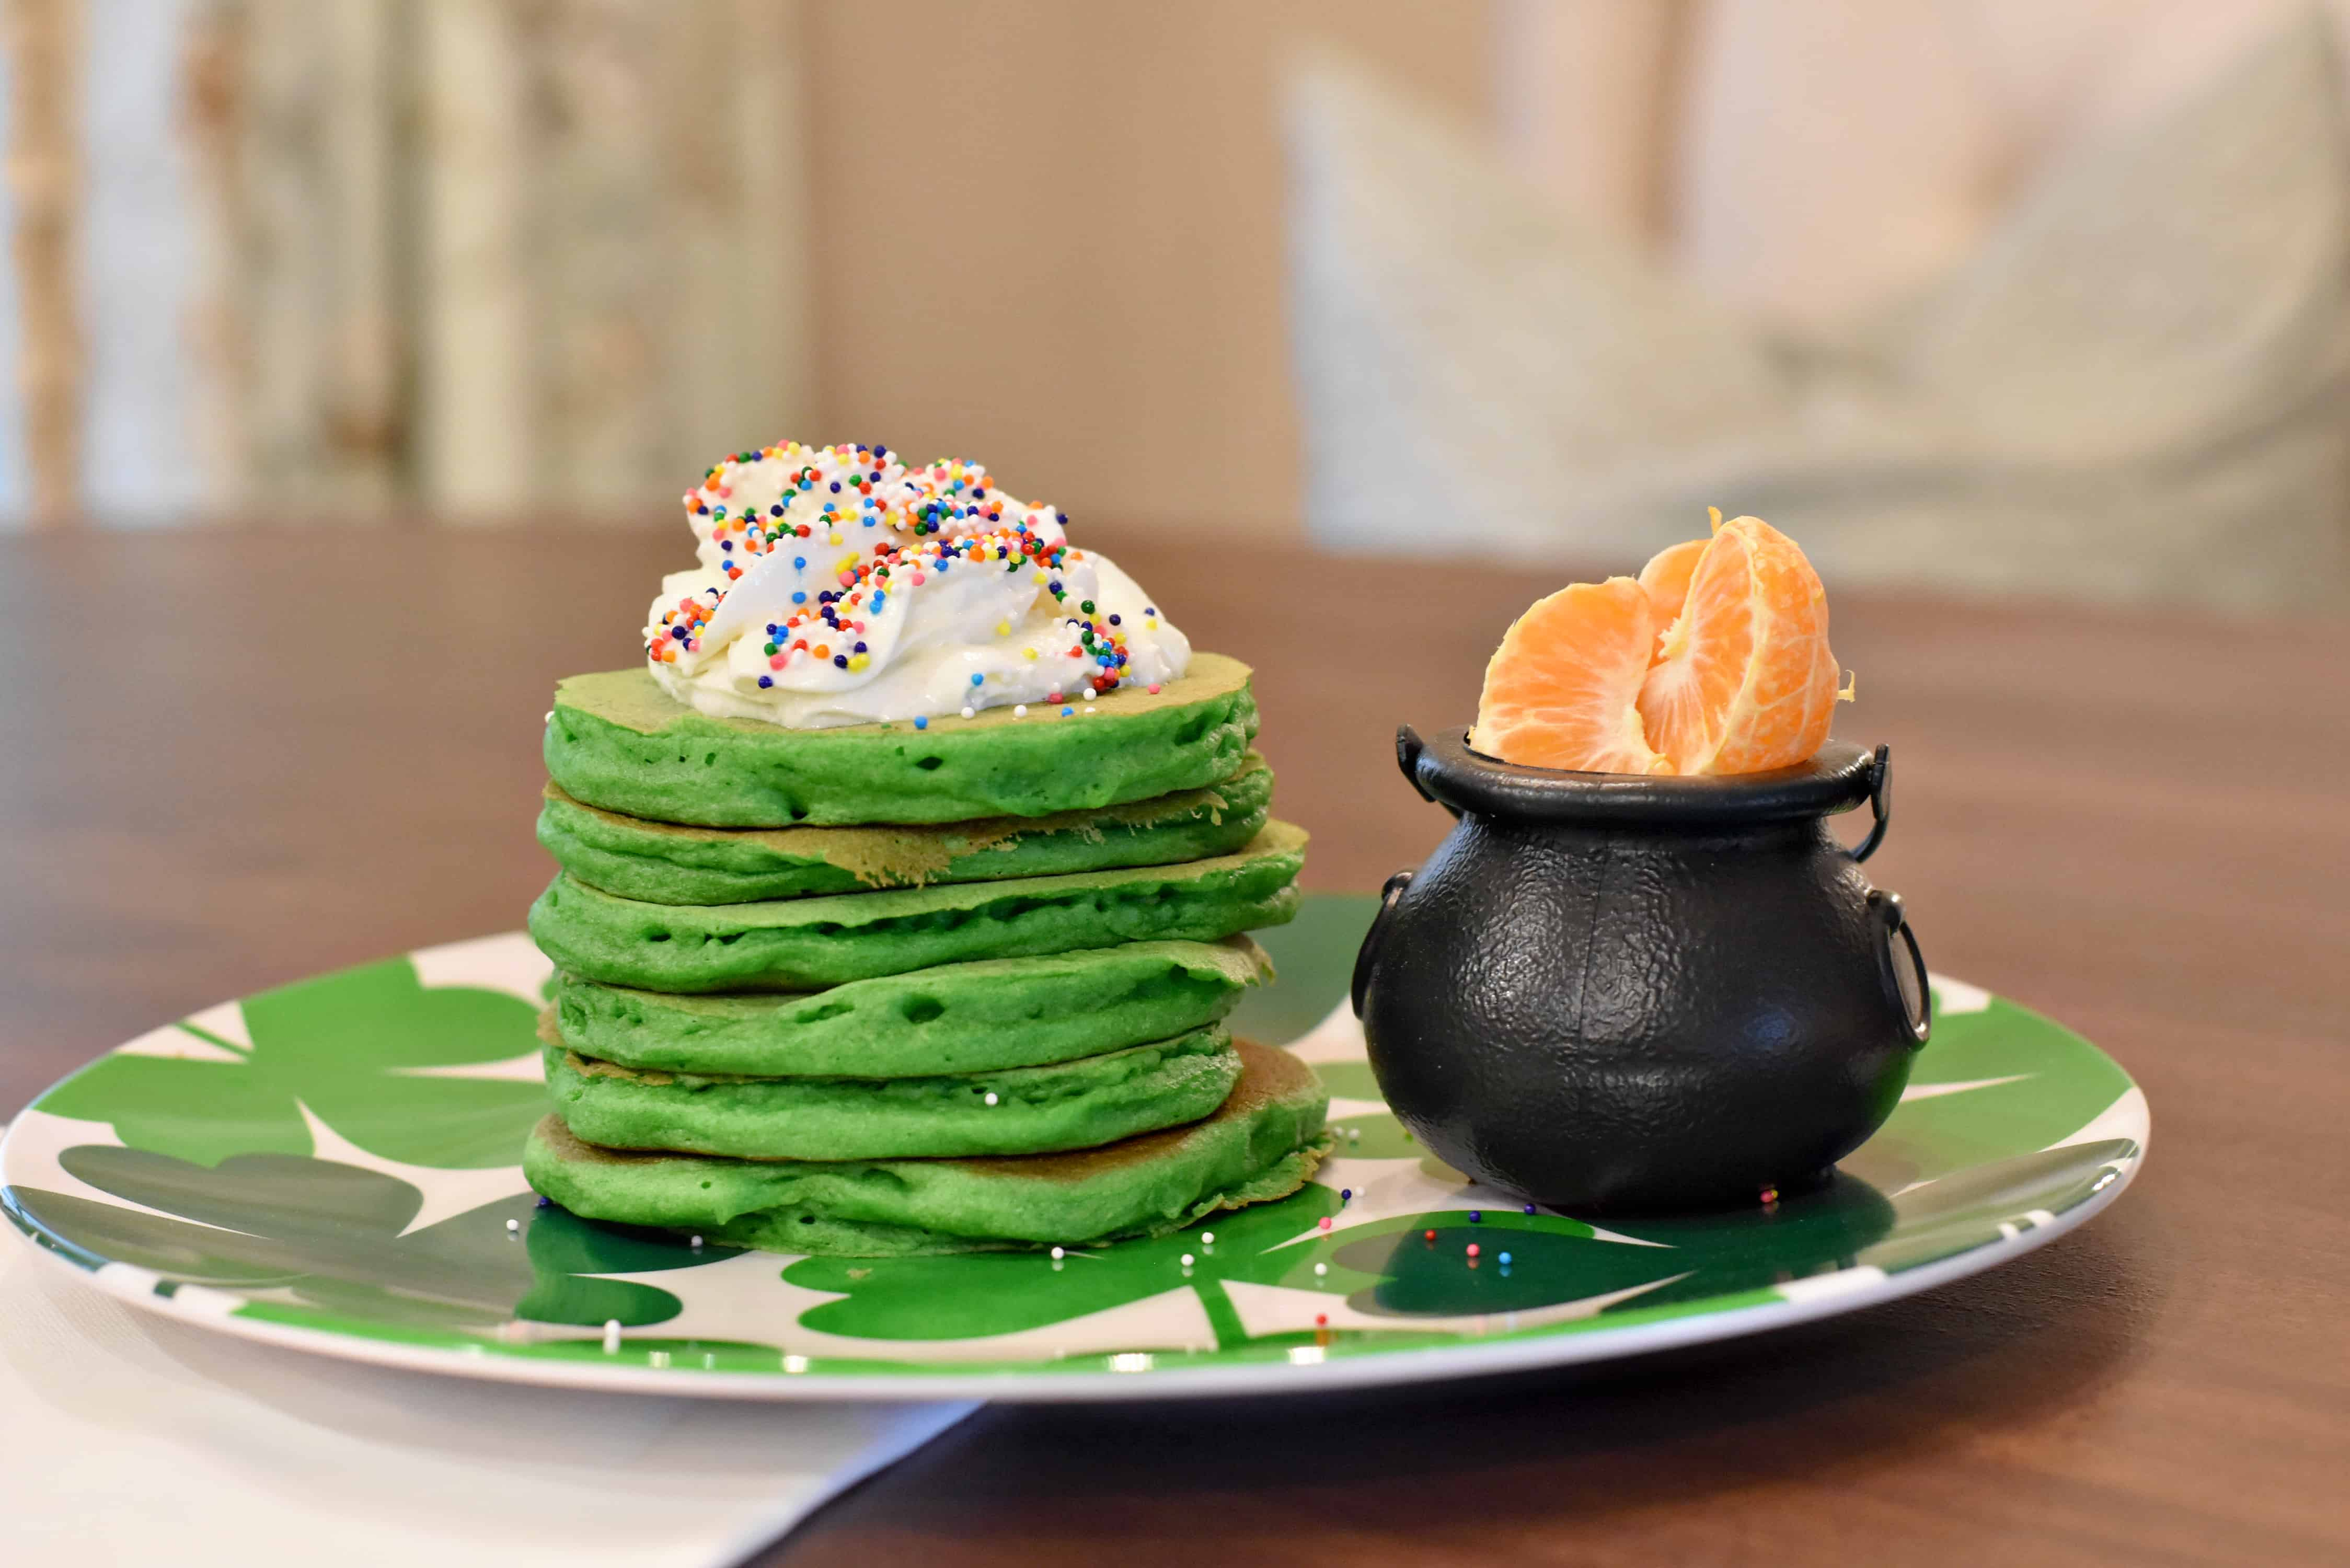 How to make krusteaz pancake mix taste better